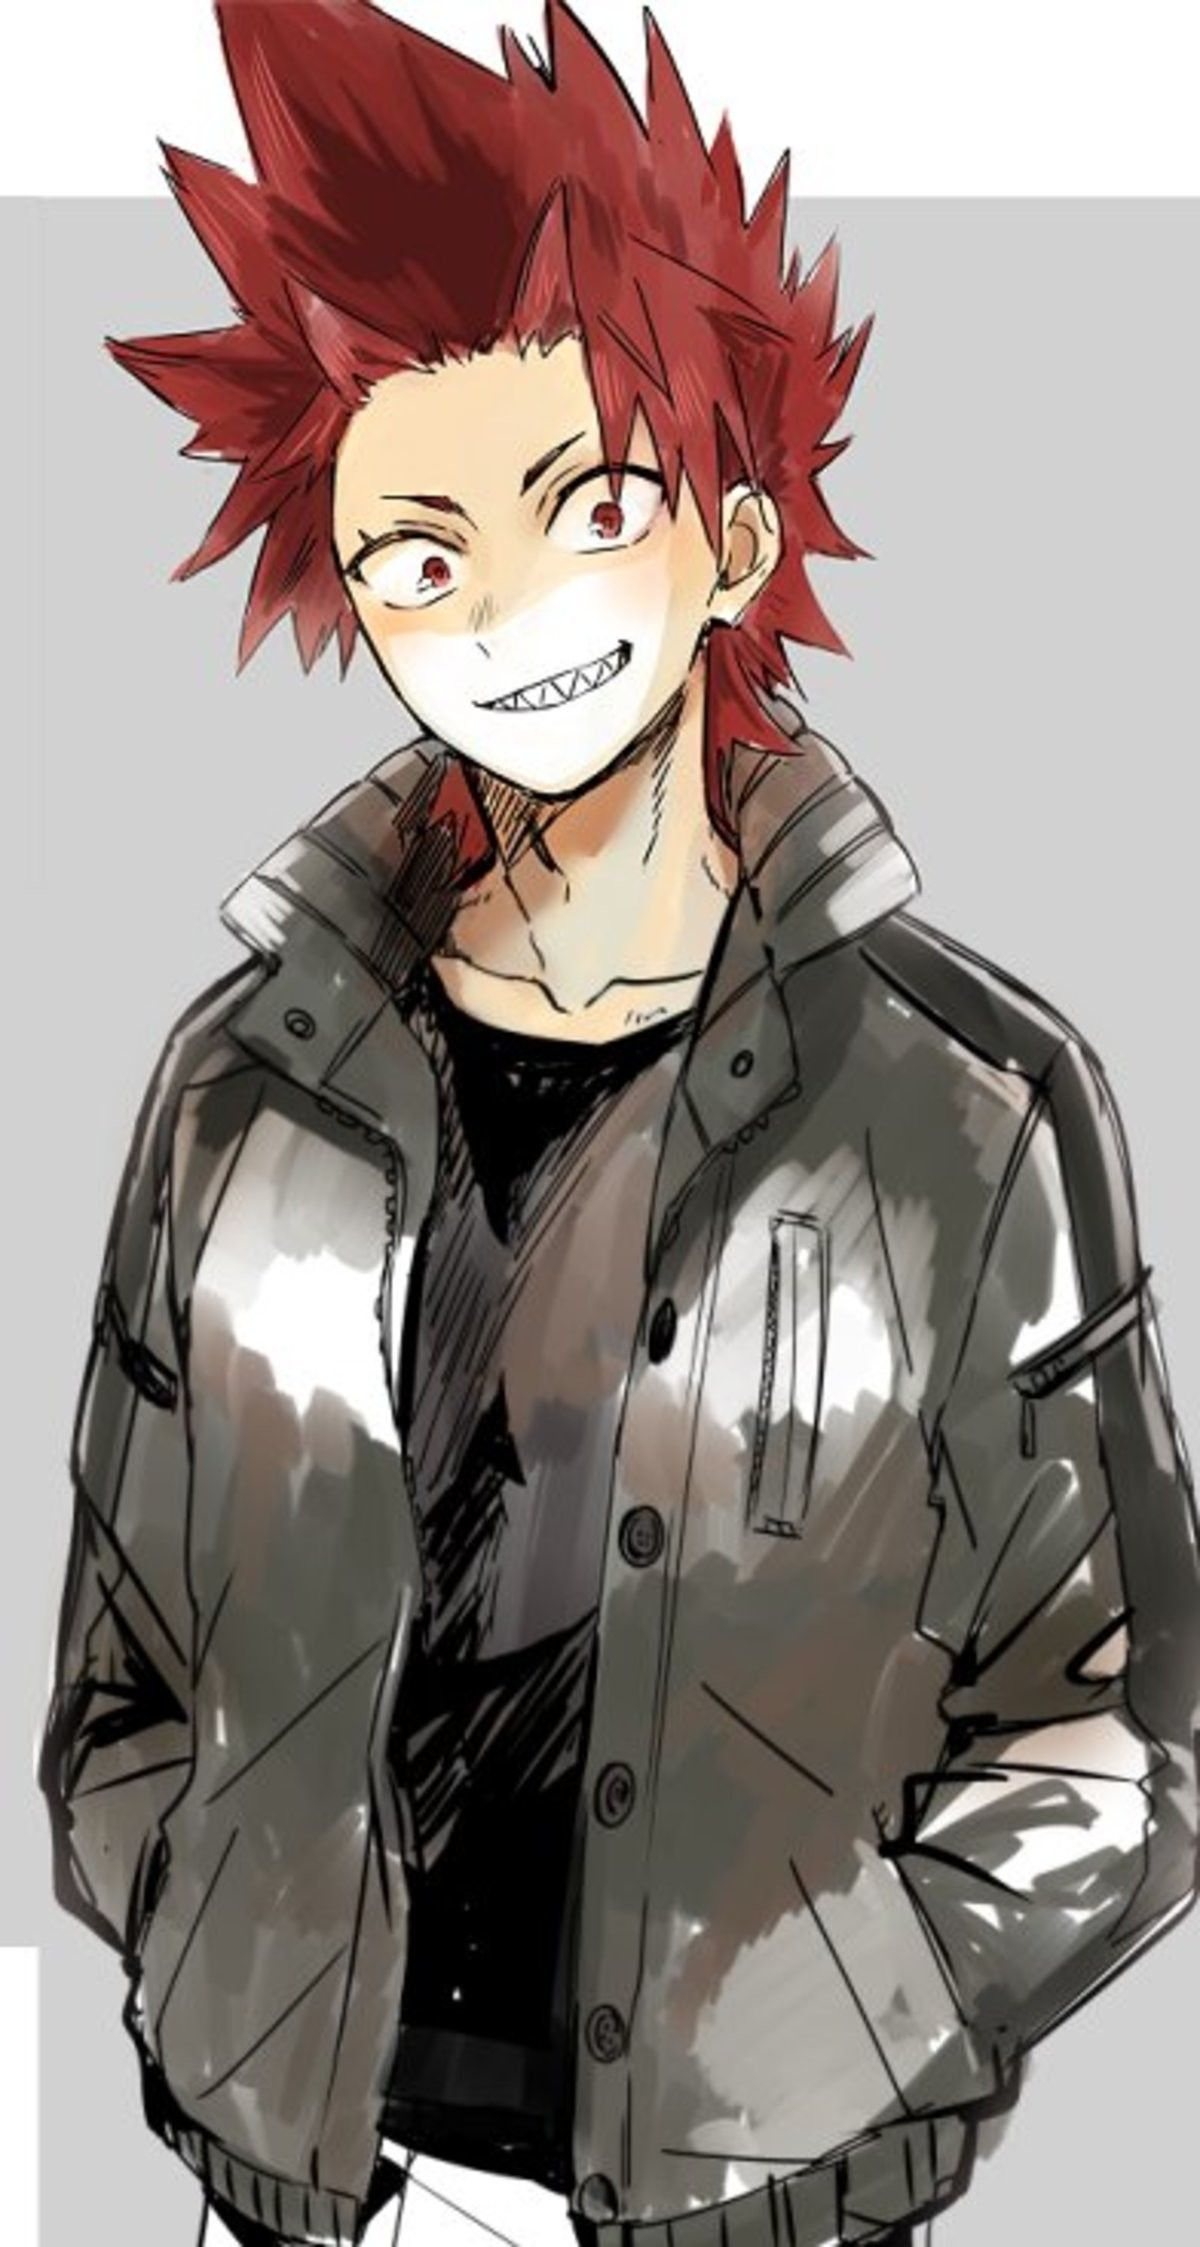 Kirishima Eijiro My Hero Academia Mha Bnha Hero Anime Plusultra Kirishima My Hero Academia Hero Kirishima Eijirou